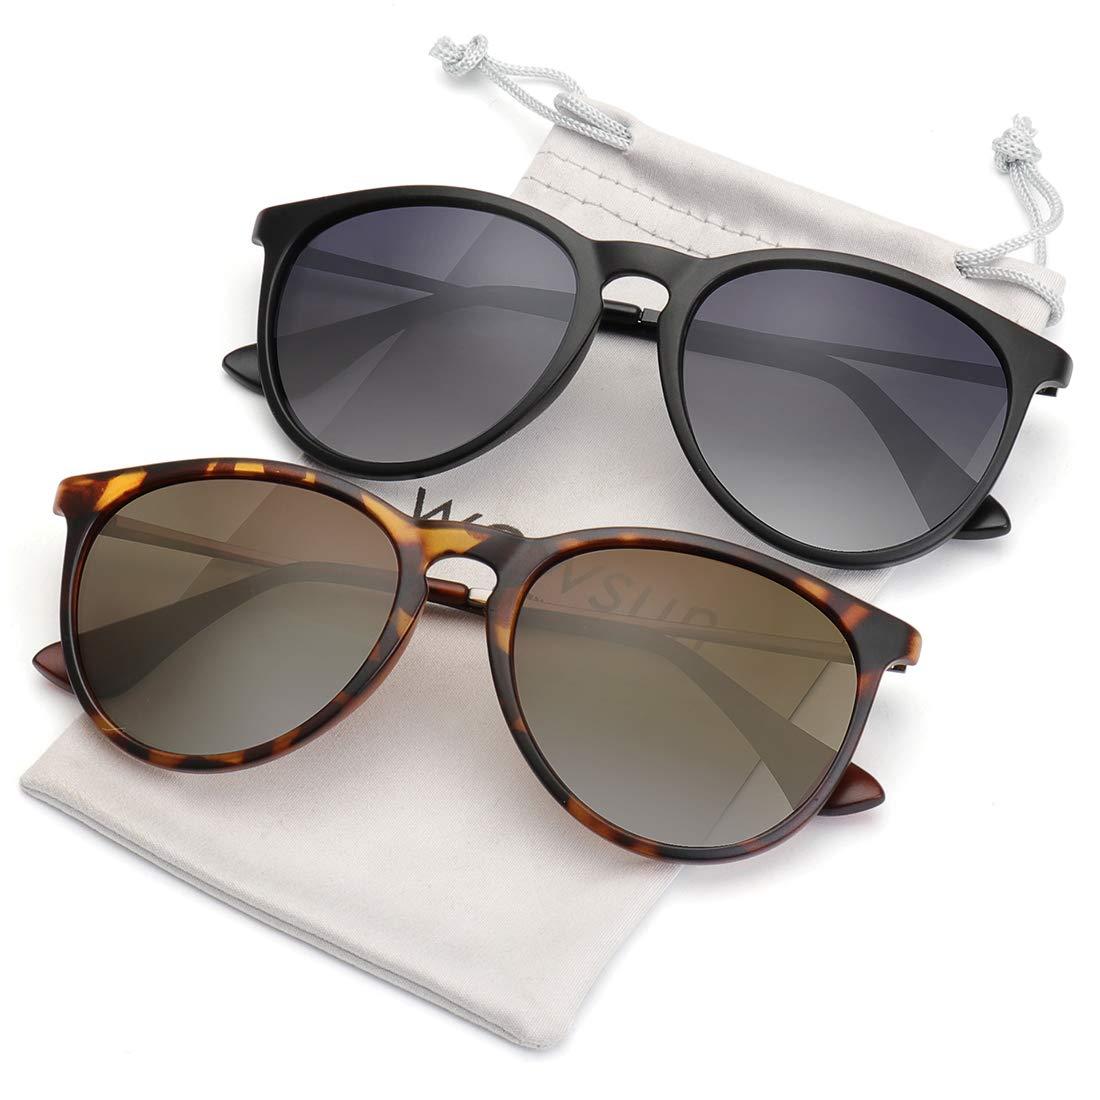 WOWSUN Polarized Sunglasses for Women Vintage Brown Gradient Lens 2 Pack Black Leopard Frames Tortoise Shell Sun Glasses Shades by WOWSUN